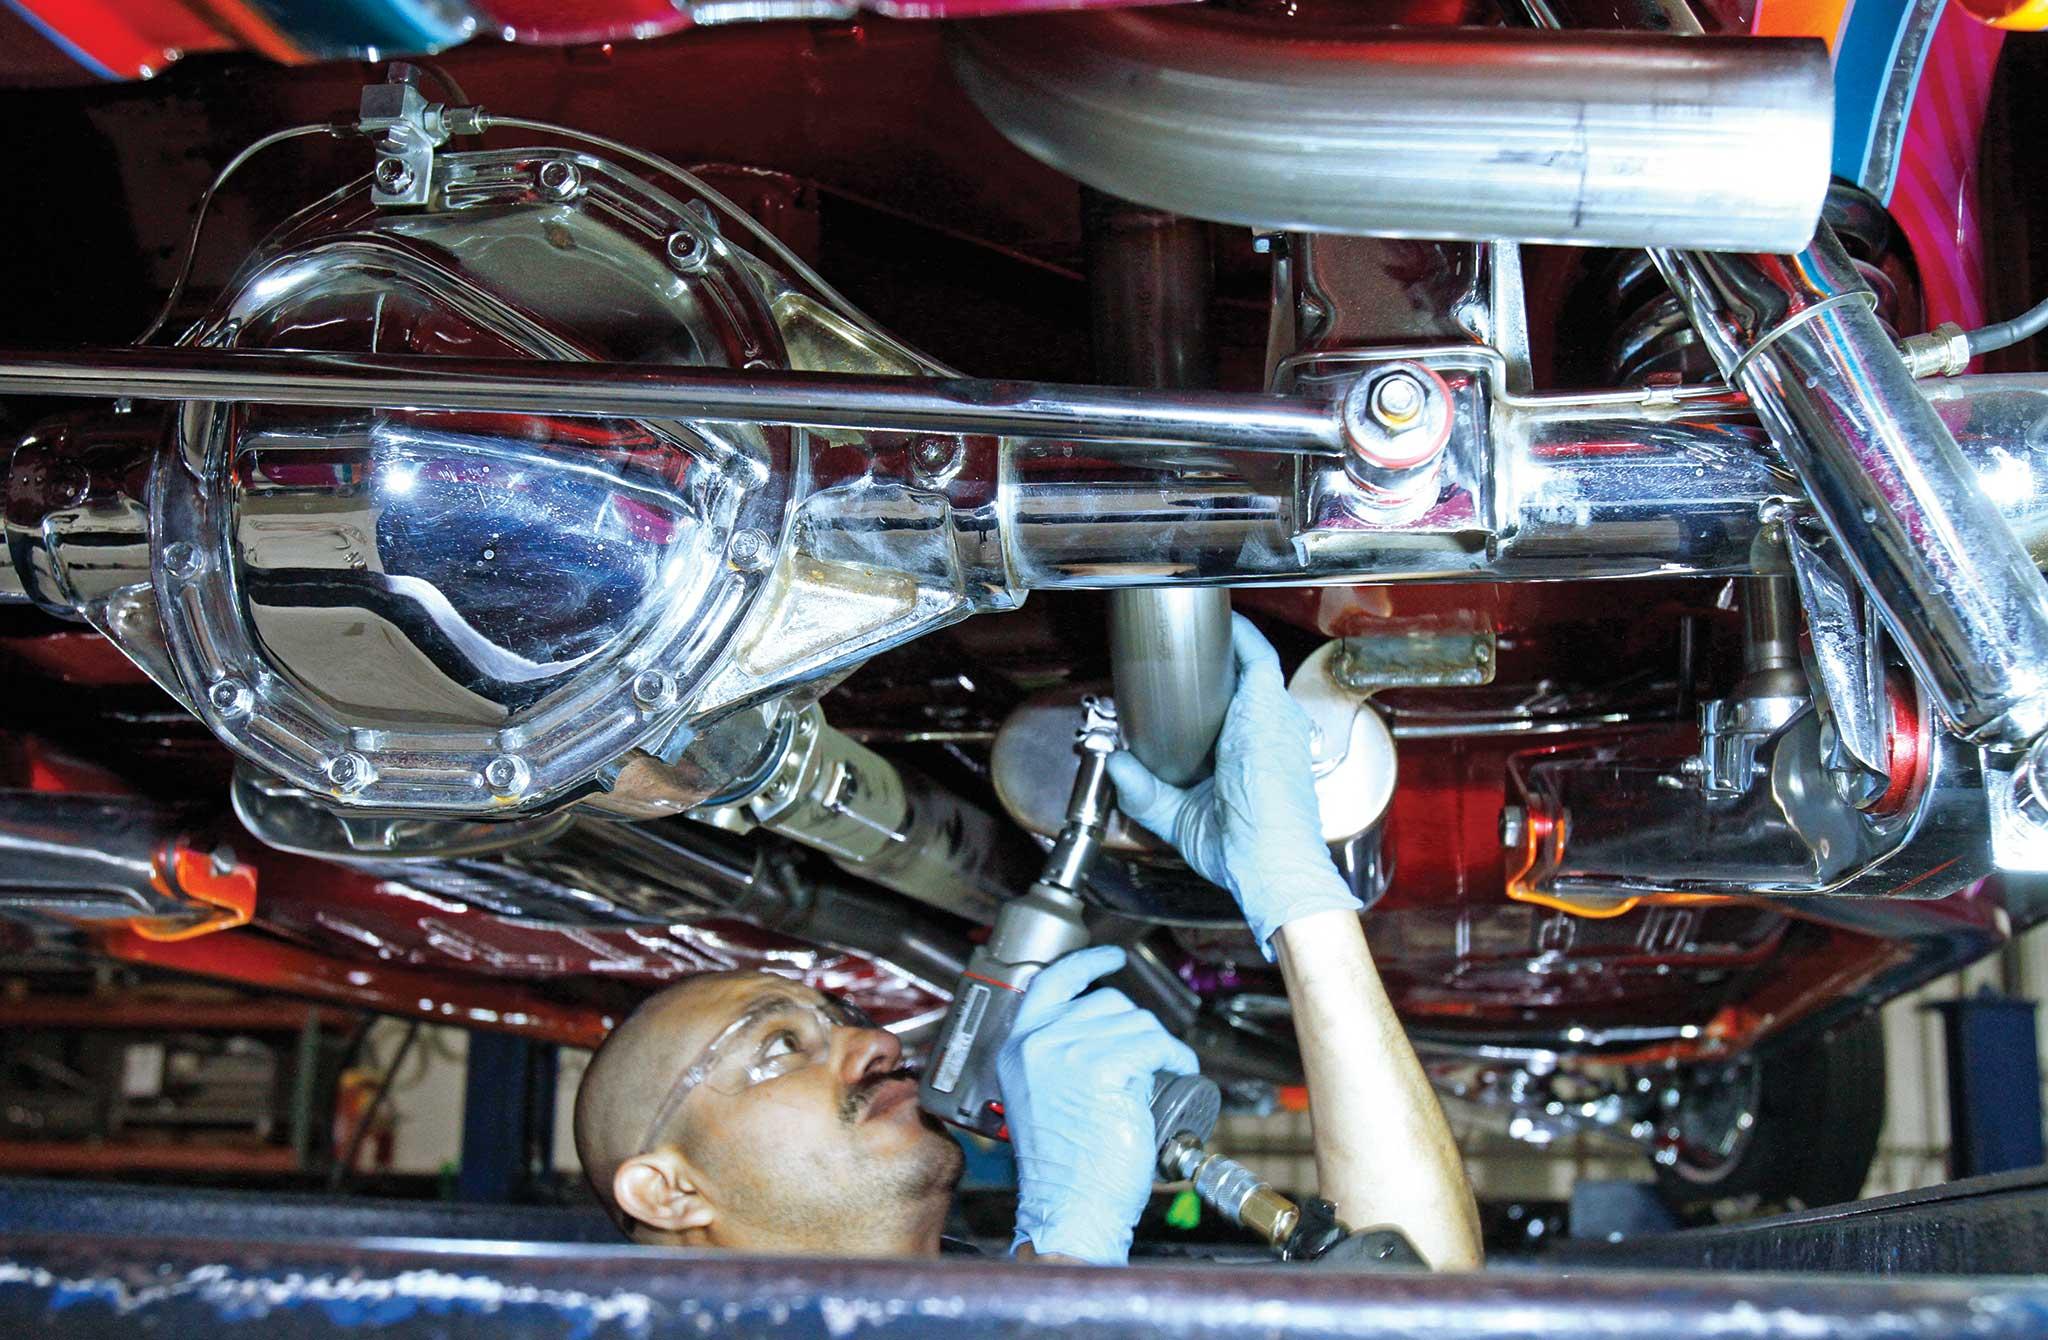 013 magnaflow exhaust install exhaust system tightening